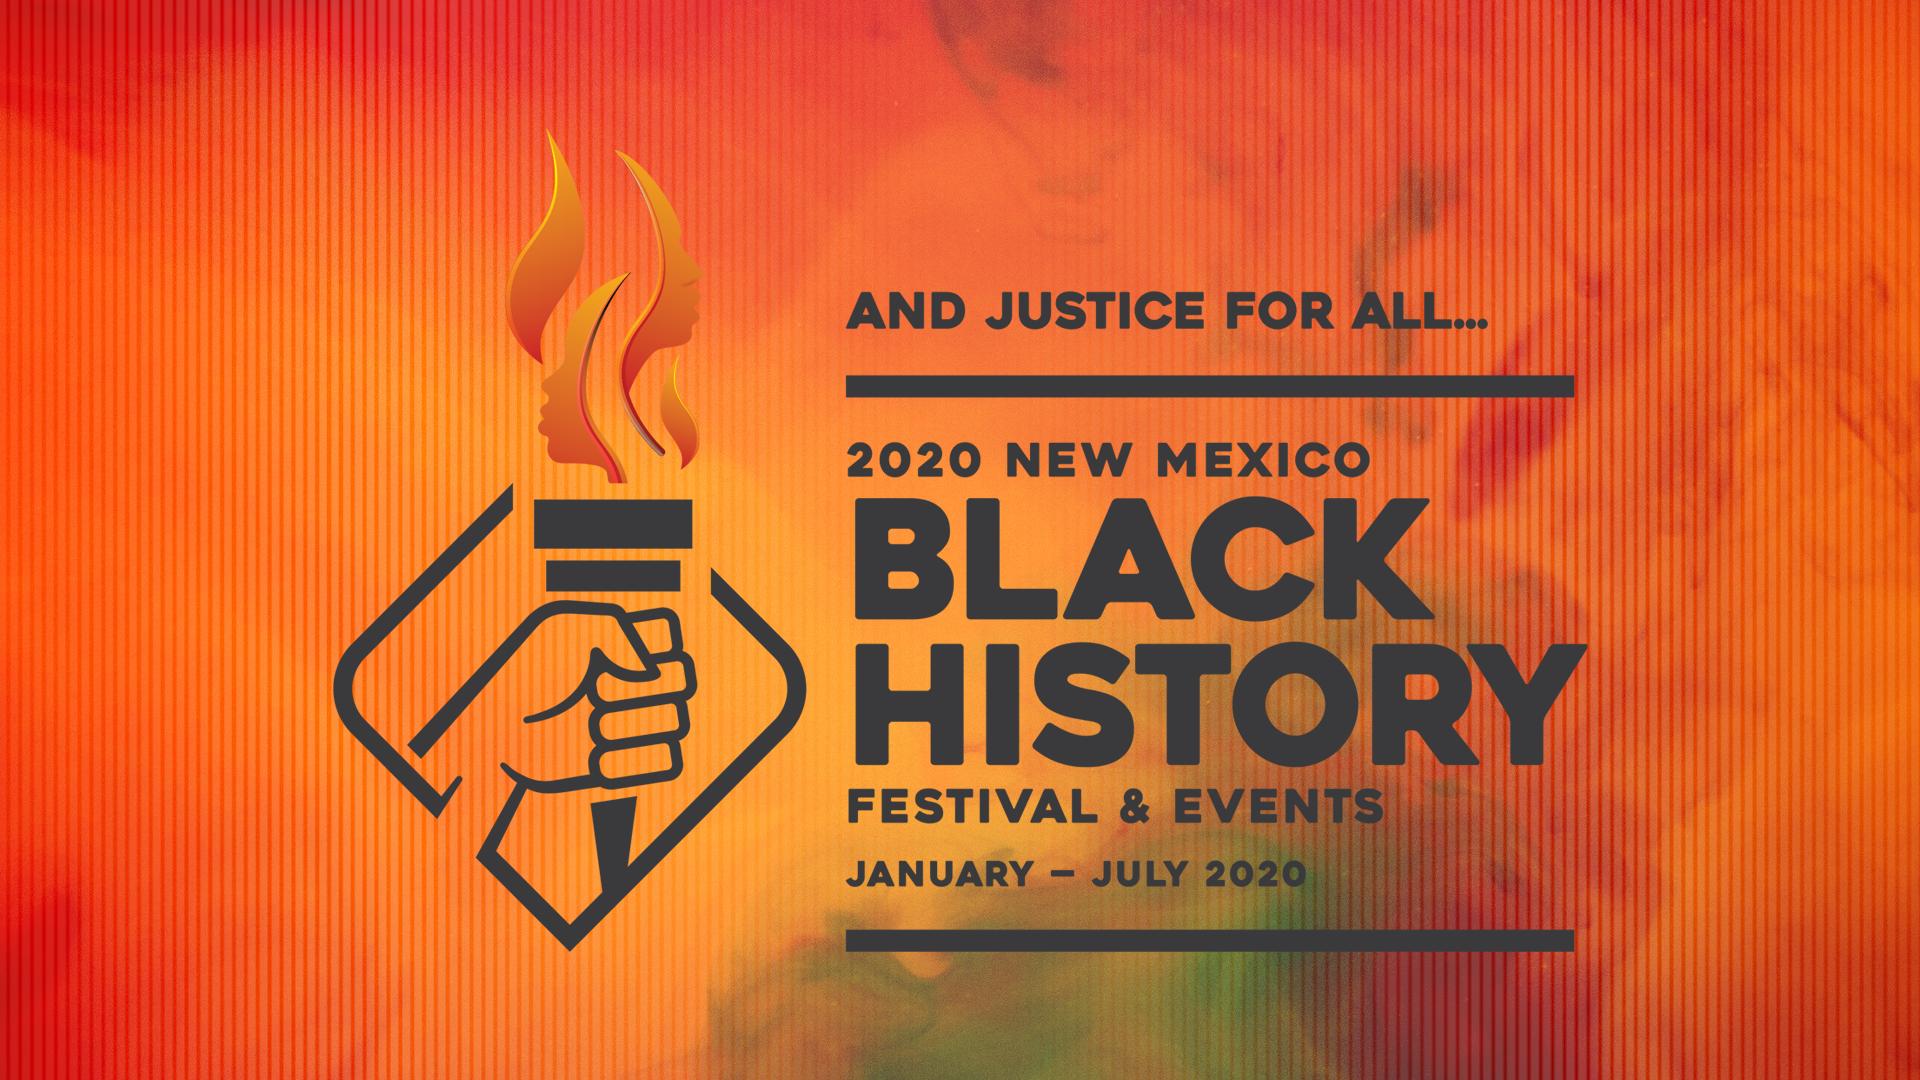 2020 Black History Festival Events NM Black History Organizing 1920x1080